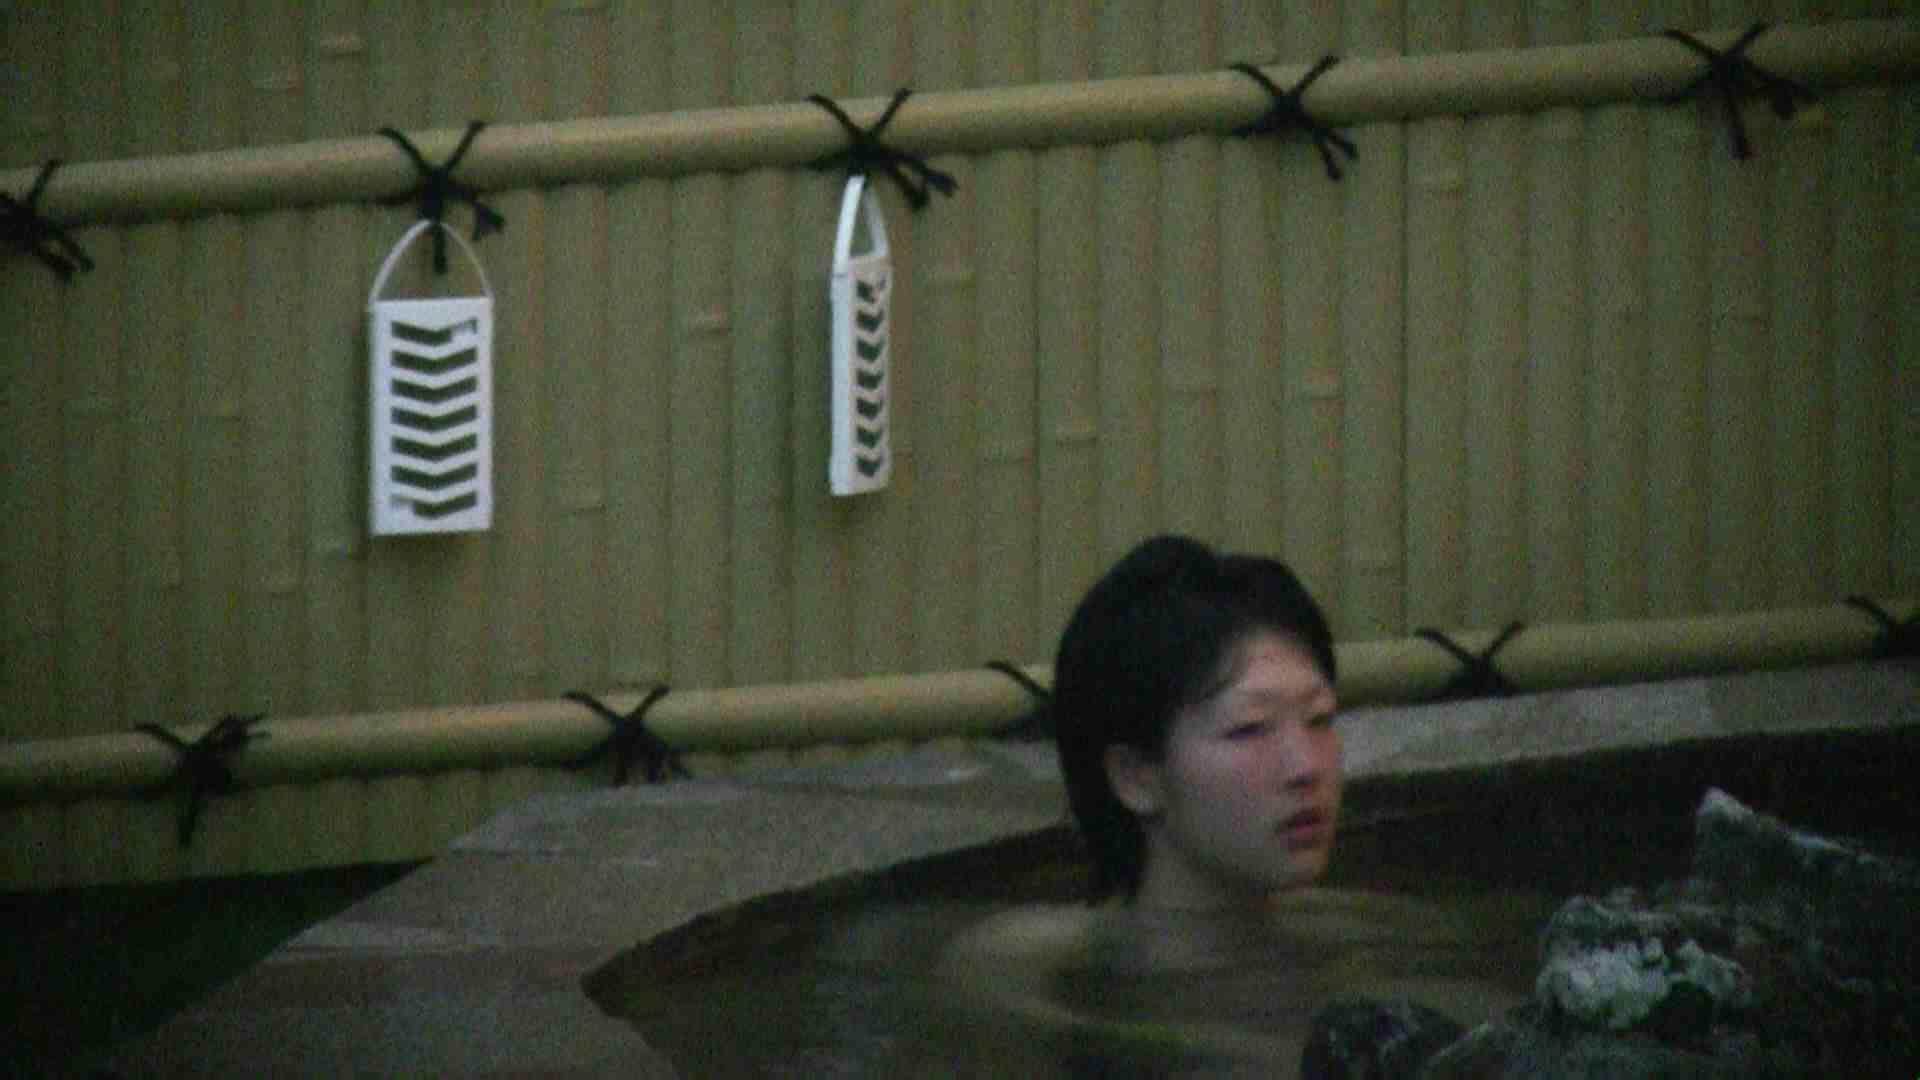 Aquaな露天風呂Vol.05【VIP】 露天風呂編 | 盗撮シリーズ  112PIX 57